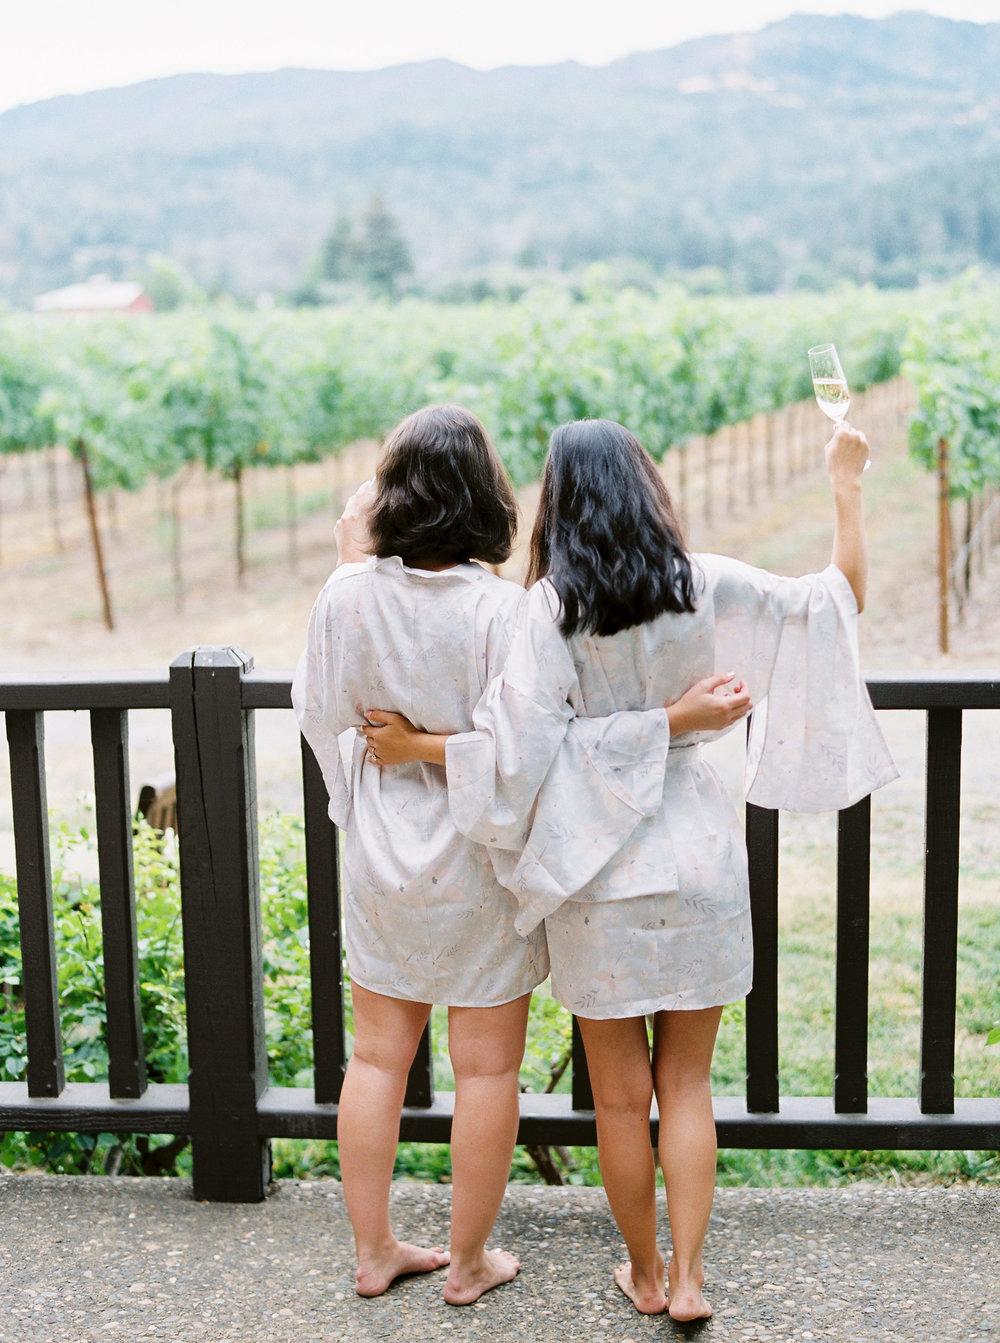 Harvest-inn-wedding-in-napa-california-66.jpg